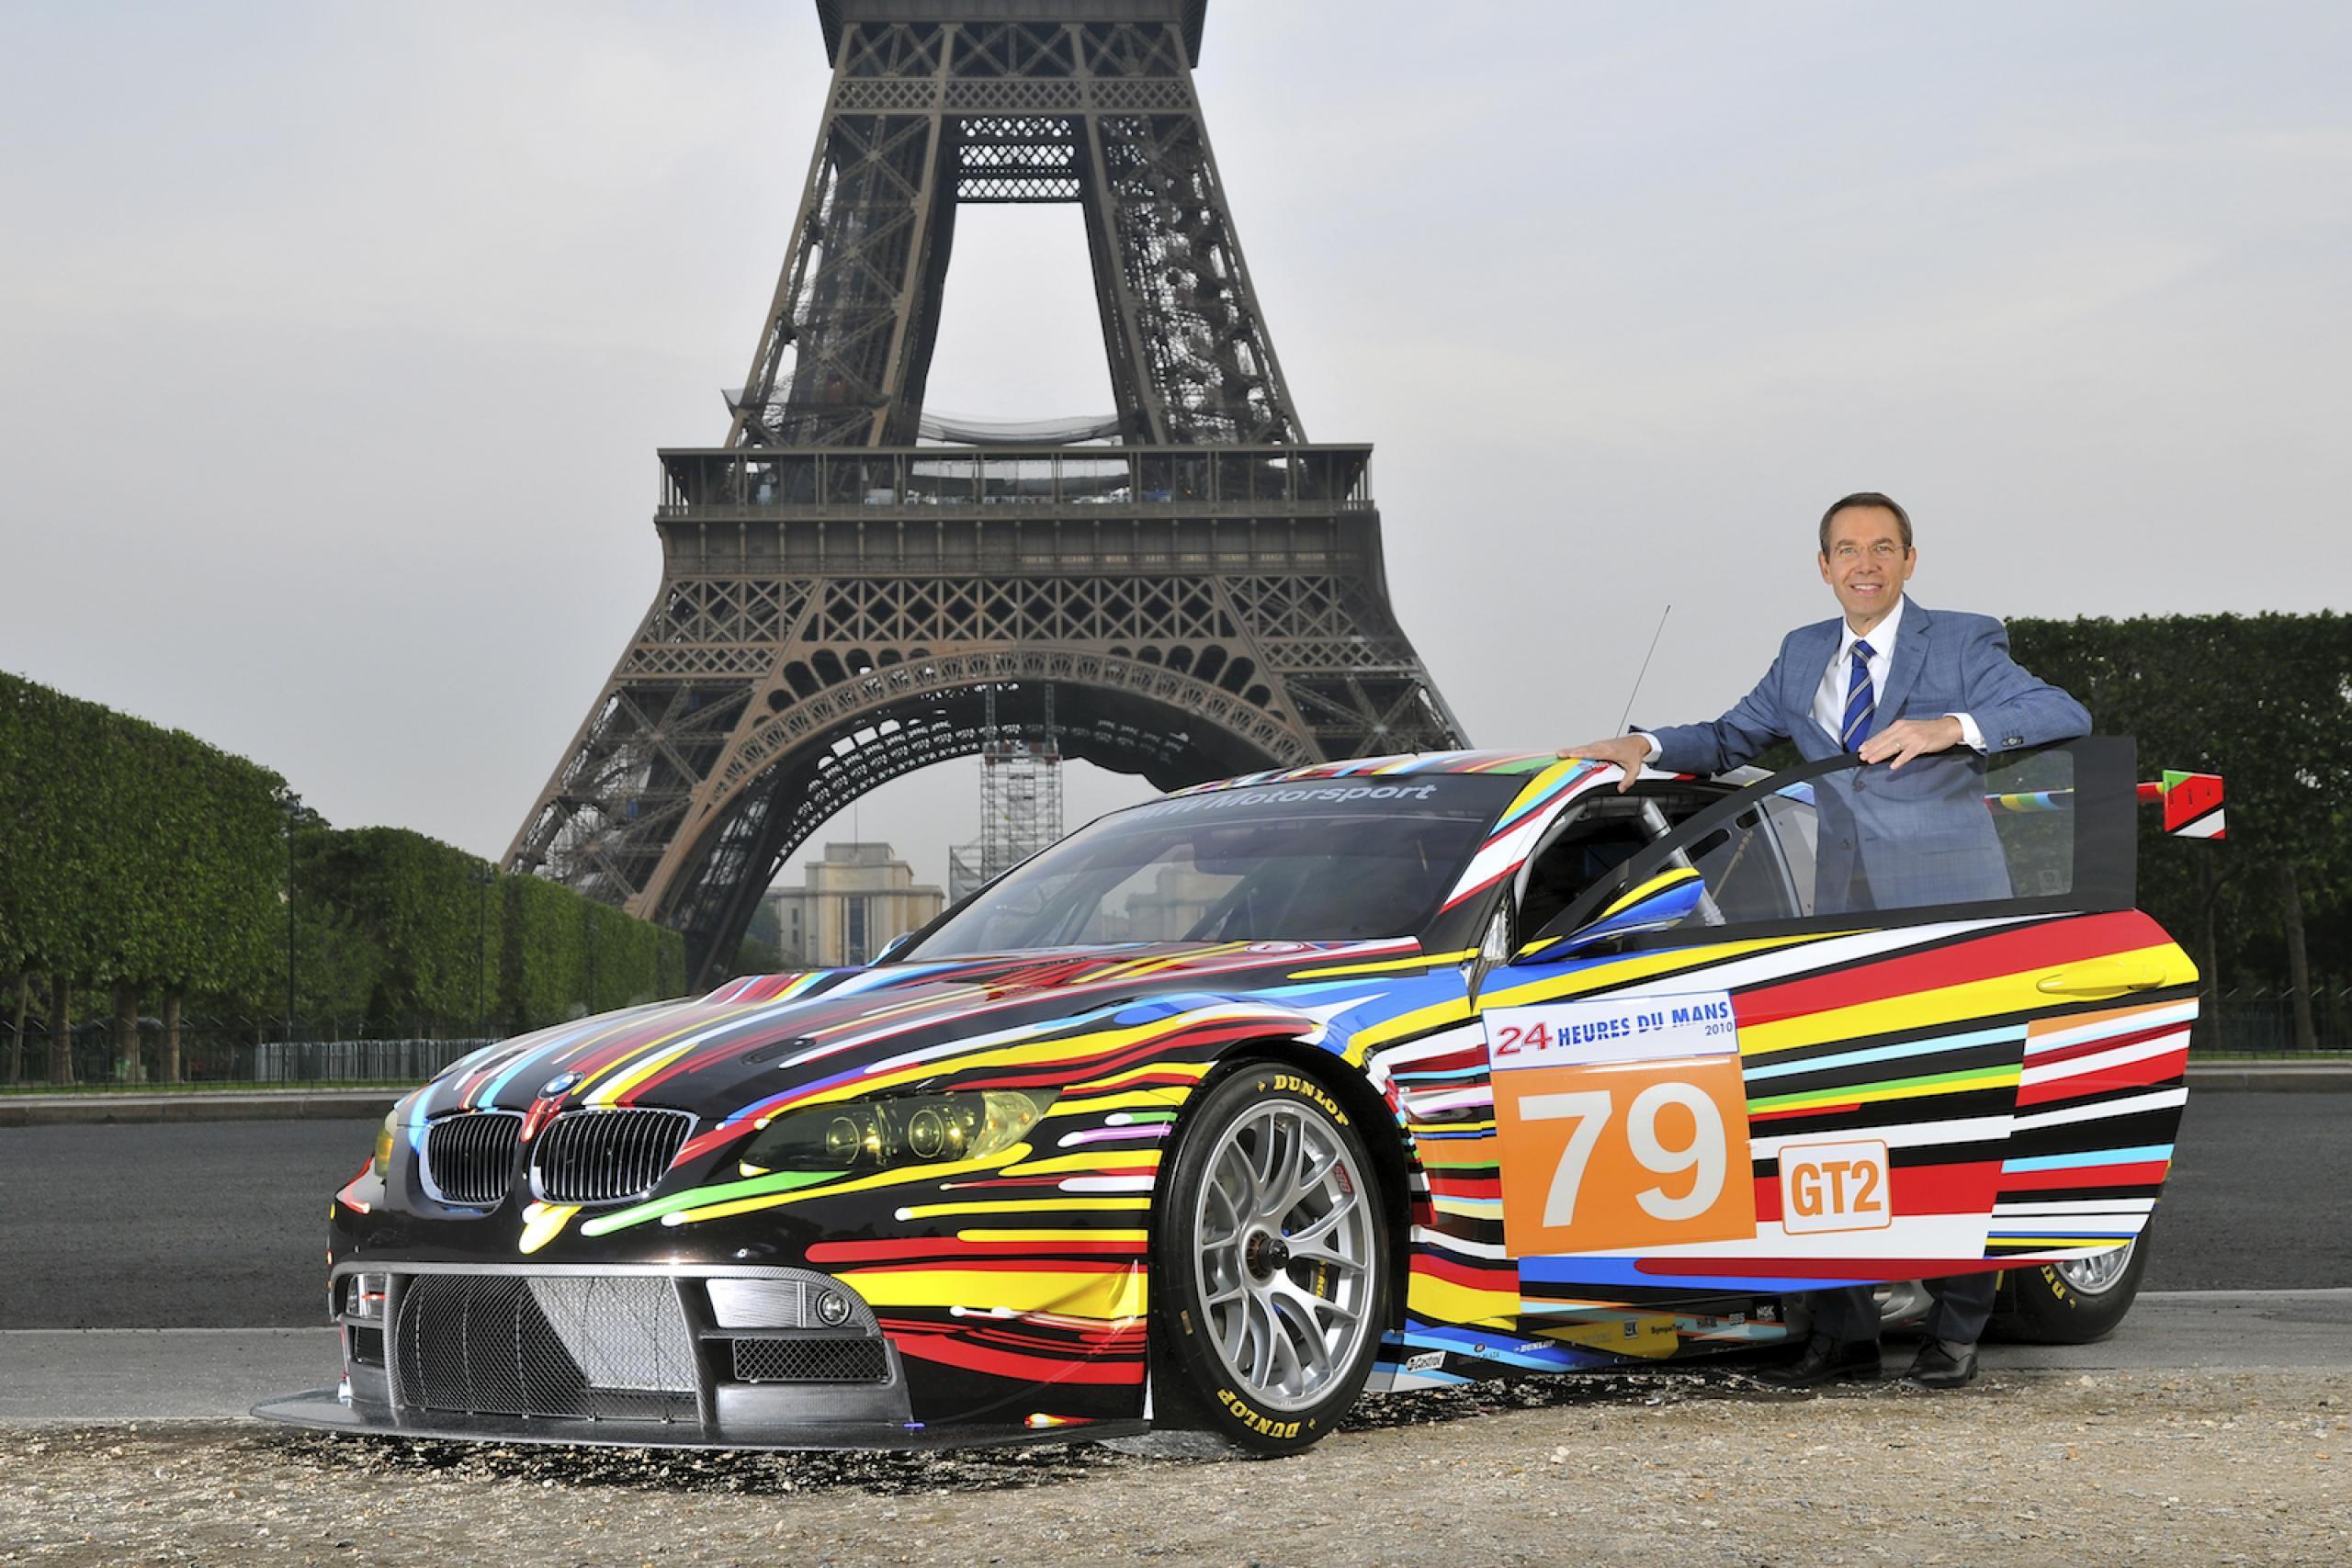 Jeff Koons with his BMW Art Car © BMW AG